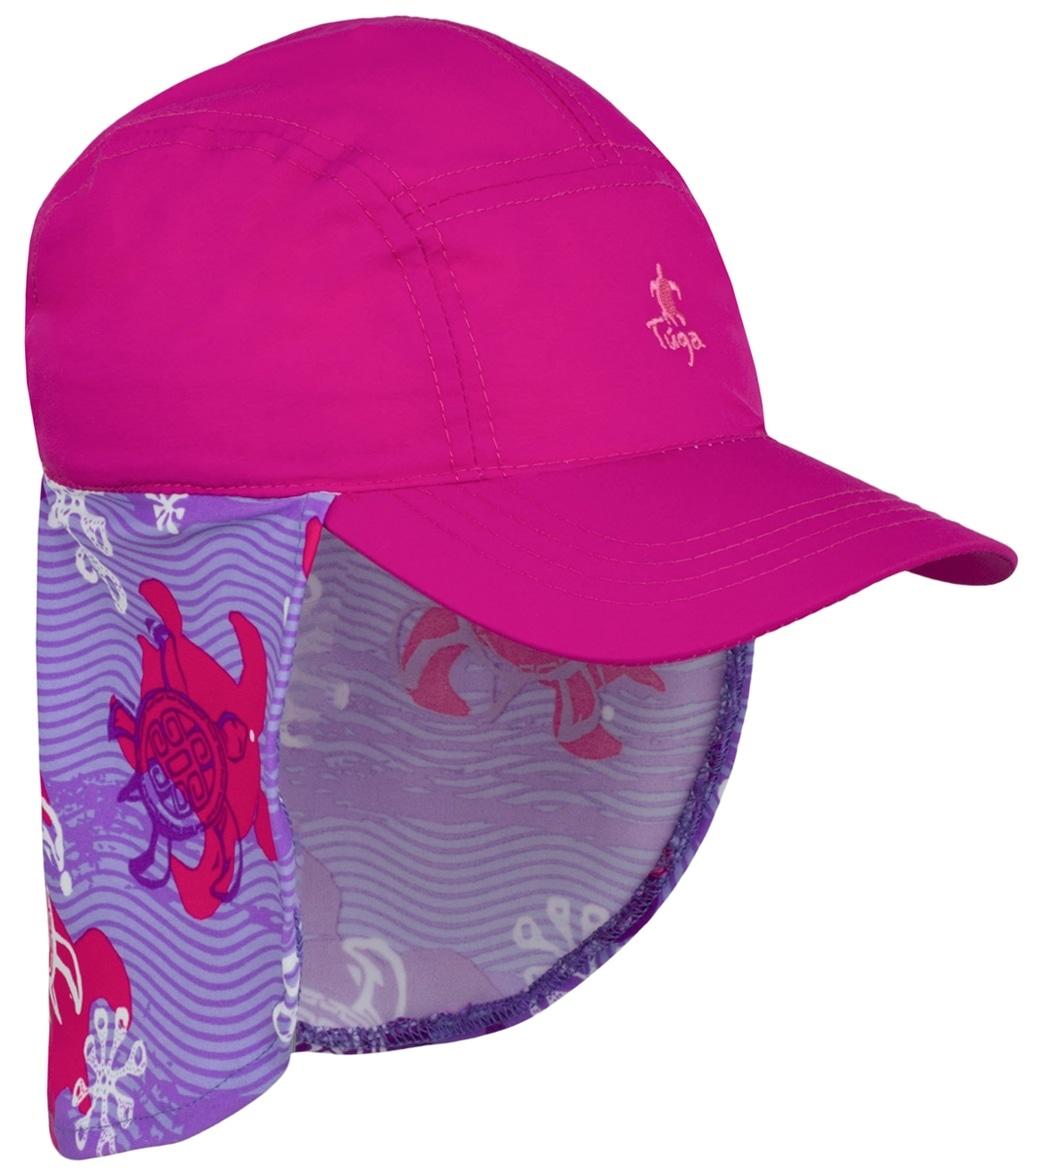 2e47441e Tuga Girls' Legionnaire Hat at SwimOutlet.com